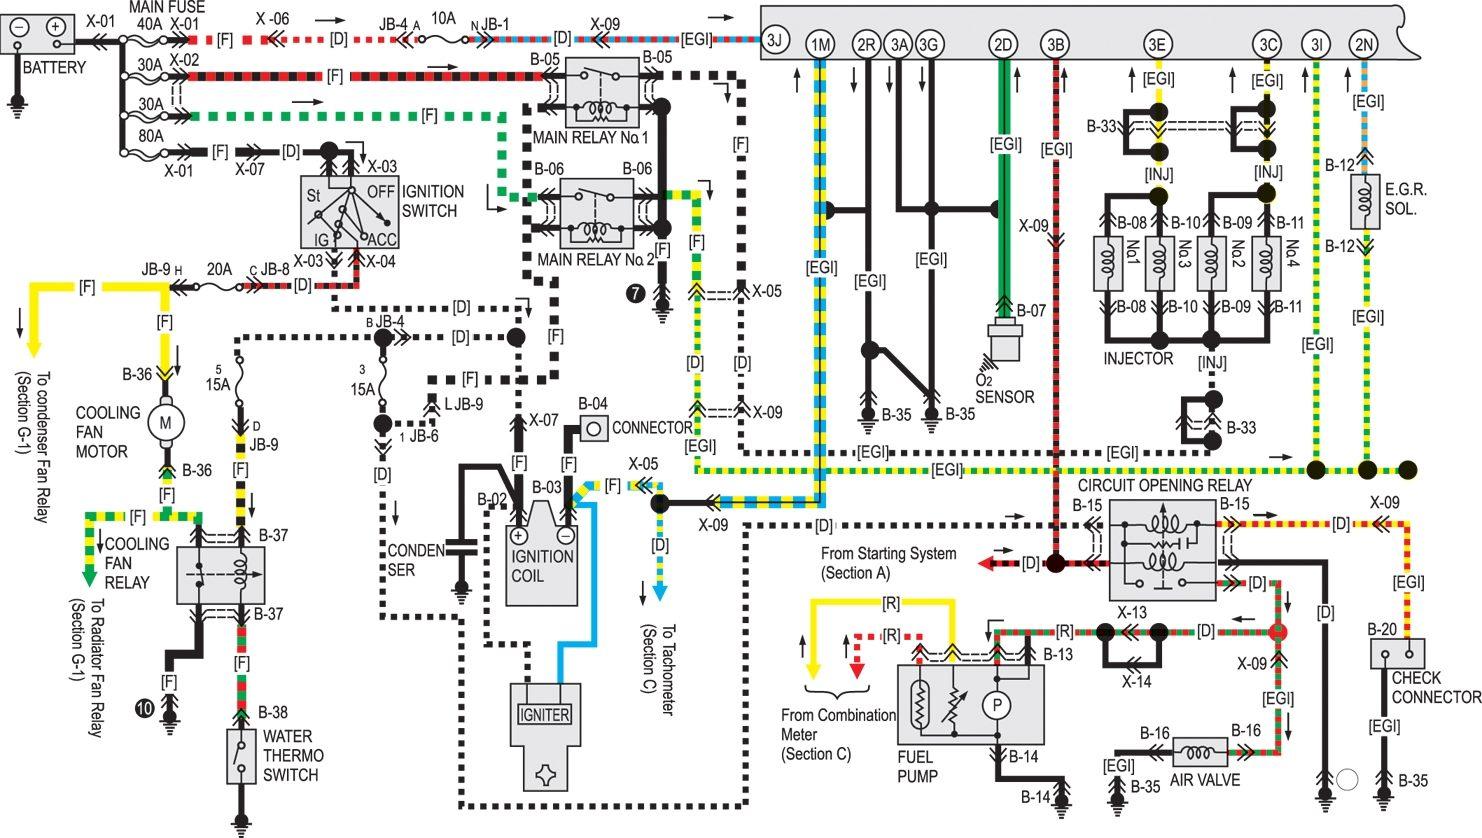 hight resolution of 1992 mazda b2200 alternator wiring diagram 87 mazda b2200 ignition wiring diagram wiring diagrams